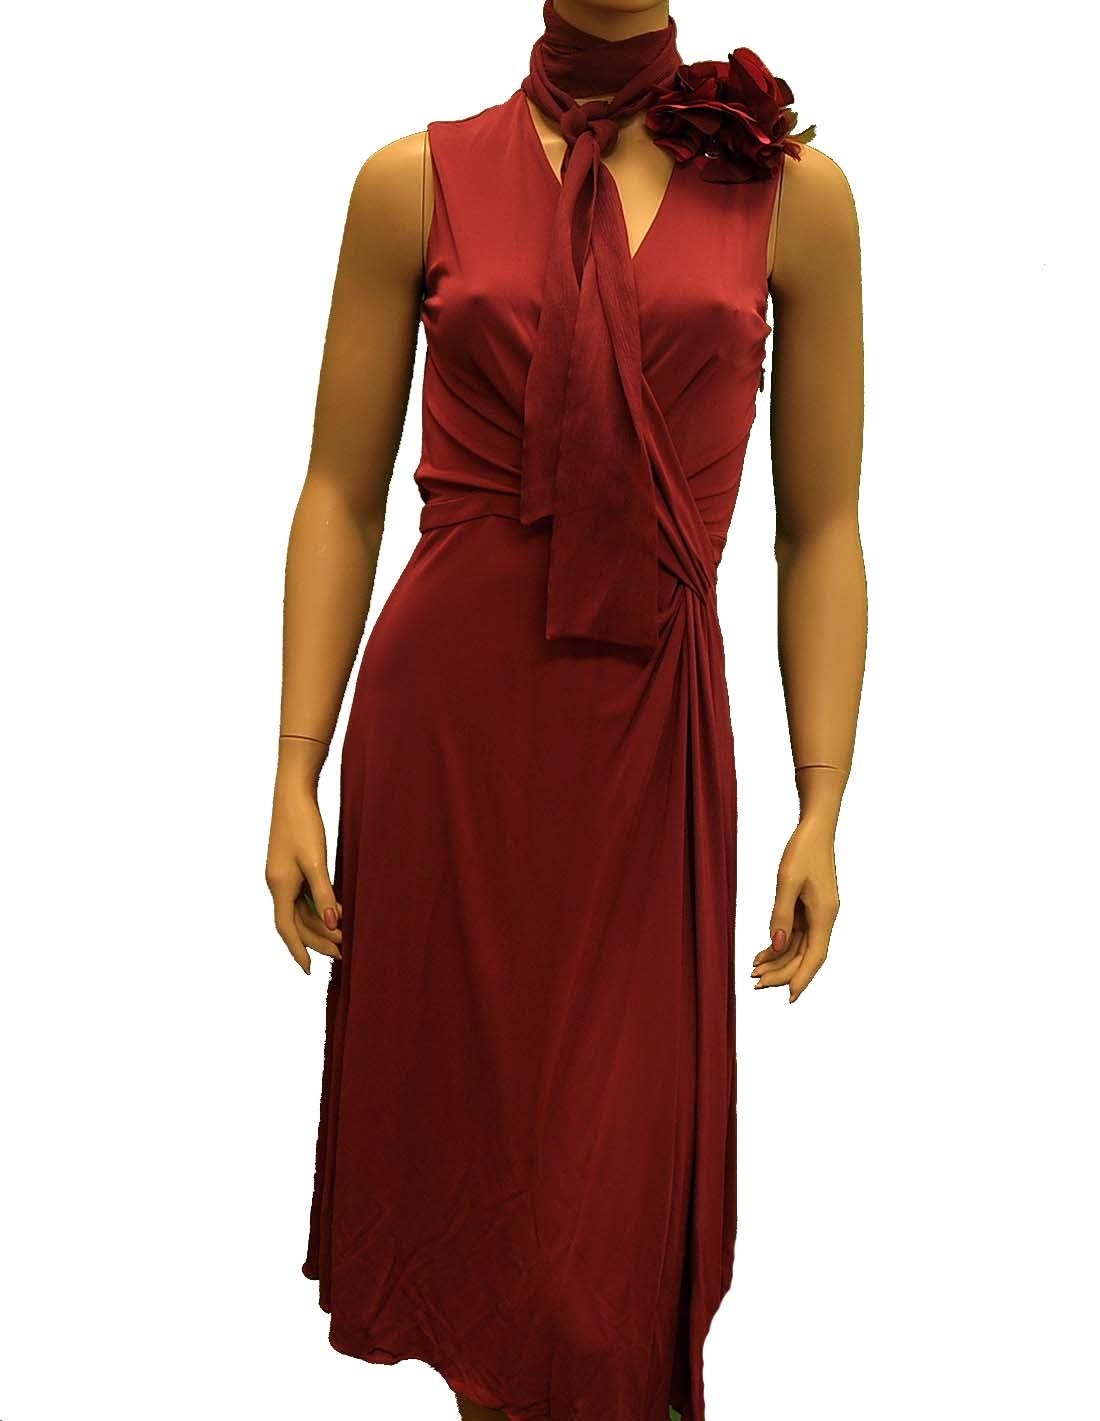 Gucci Red / Purple Viscose Knee Length Dress